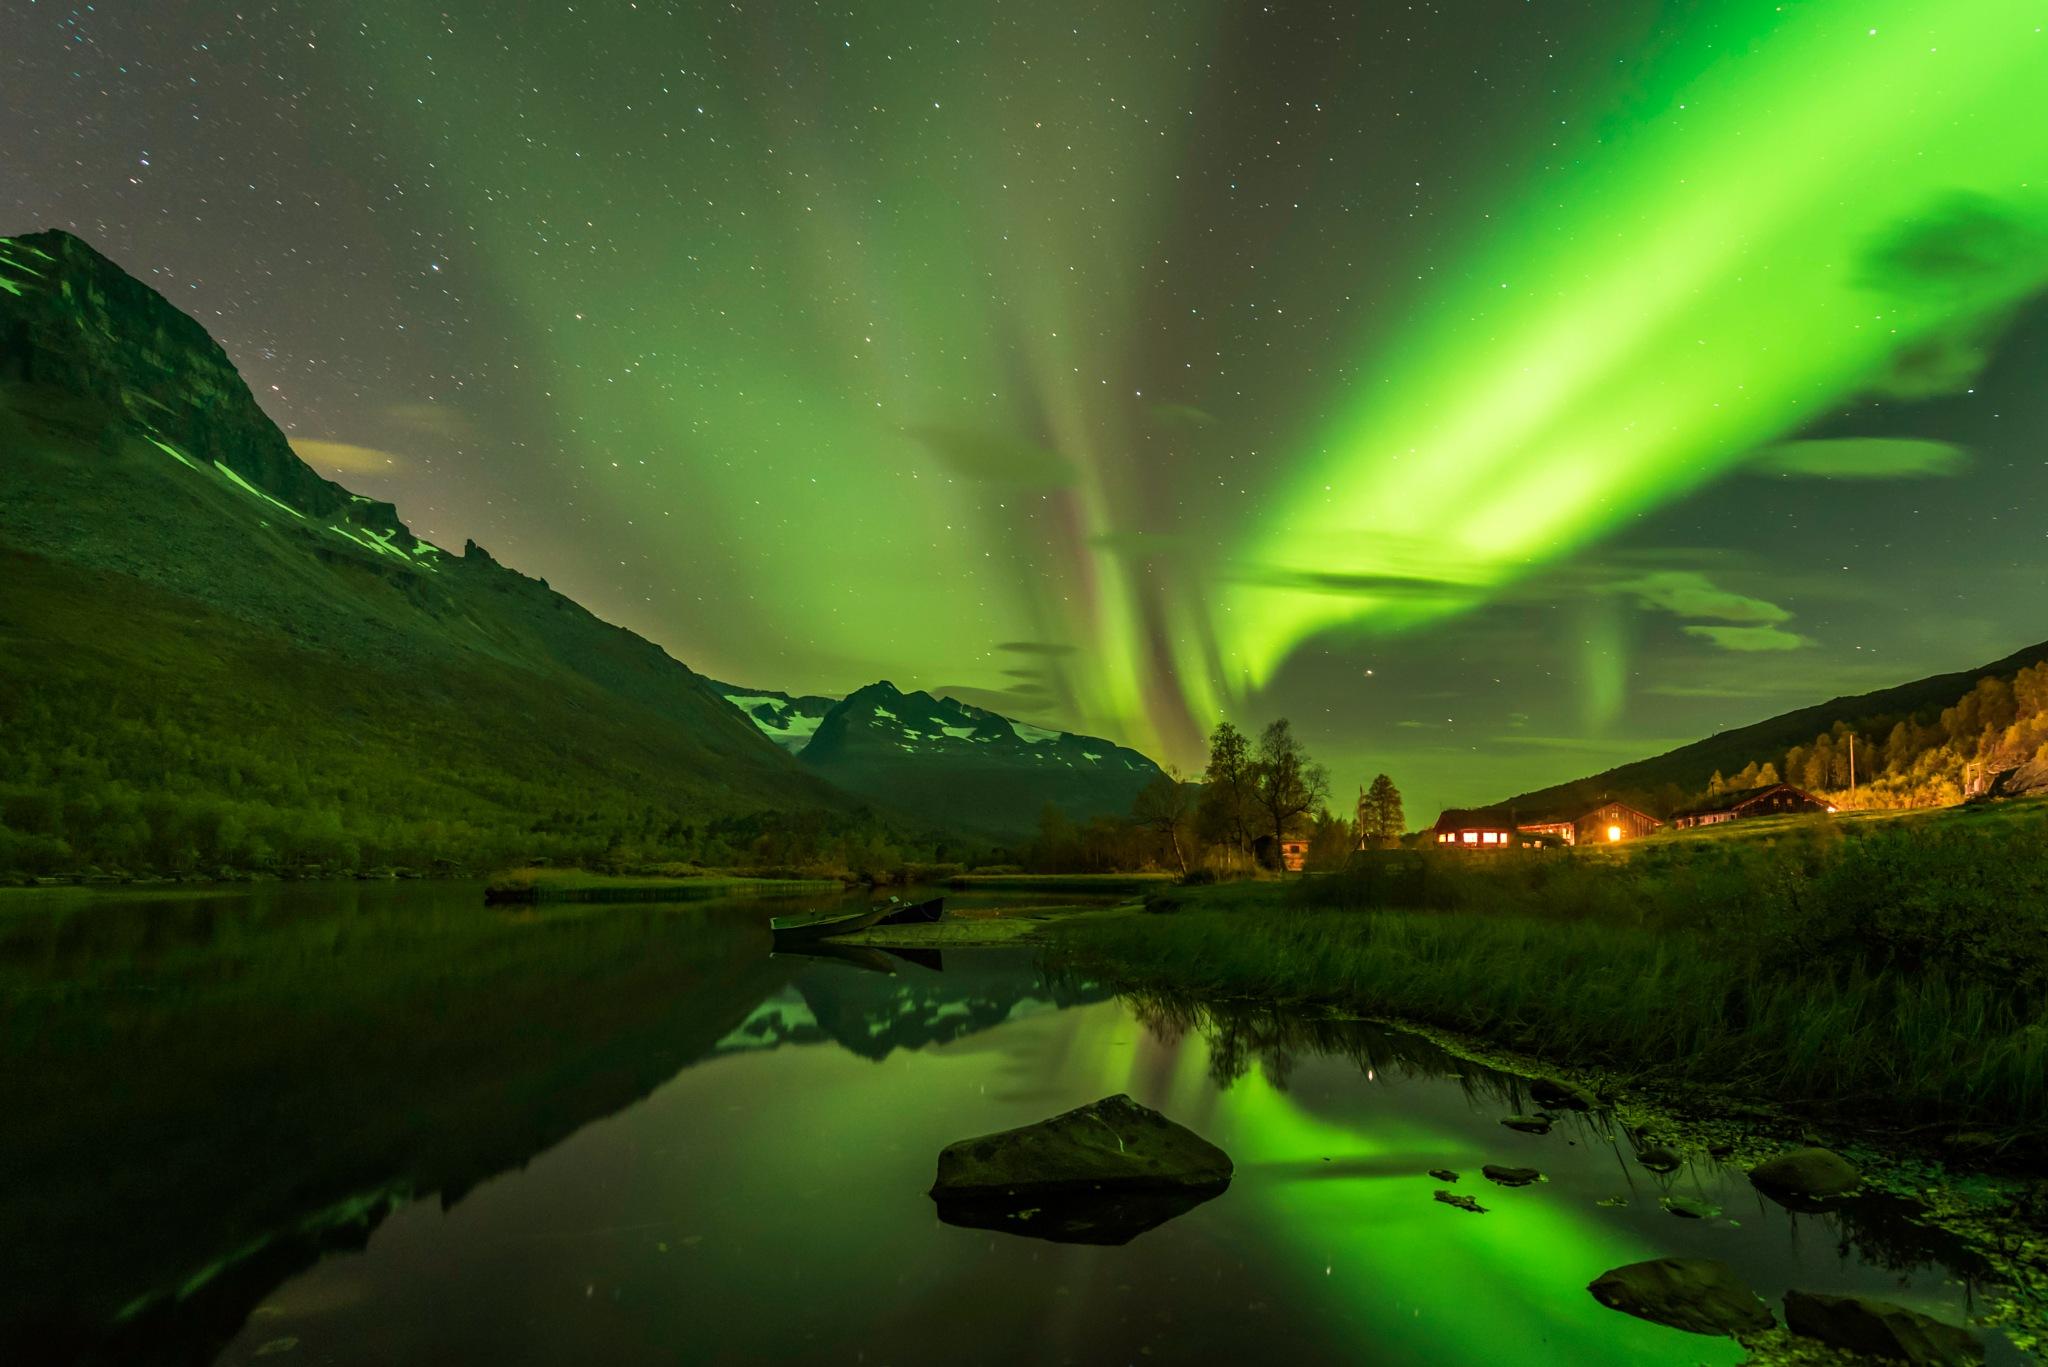 September Aurora Borealis by Ermedin Islamcevic